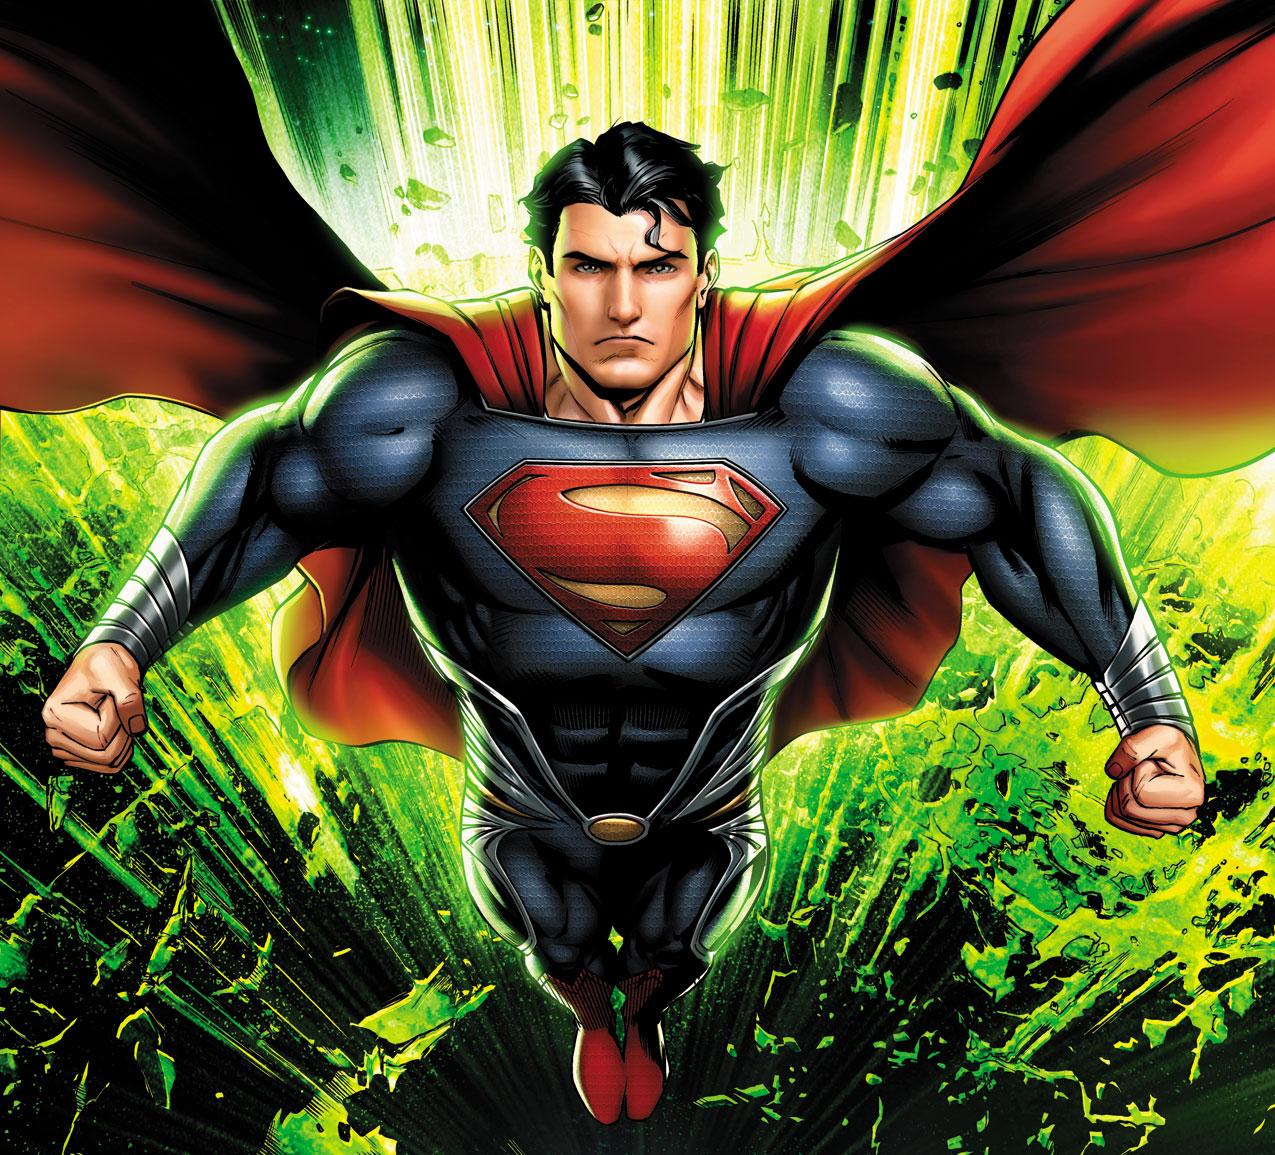 Man of Steel: The Fate of Krypton by JPRart